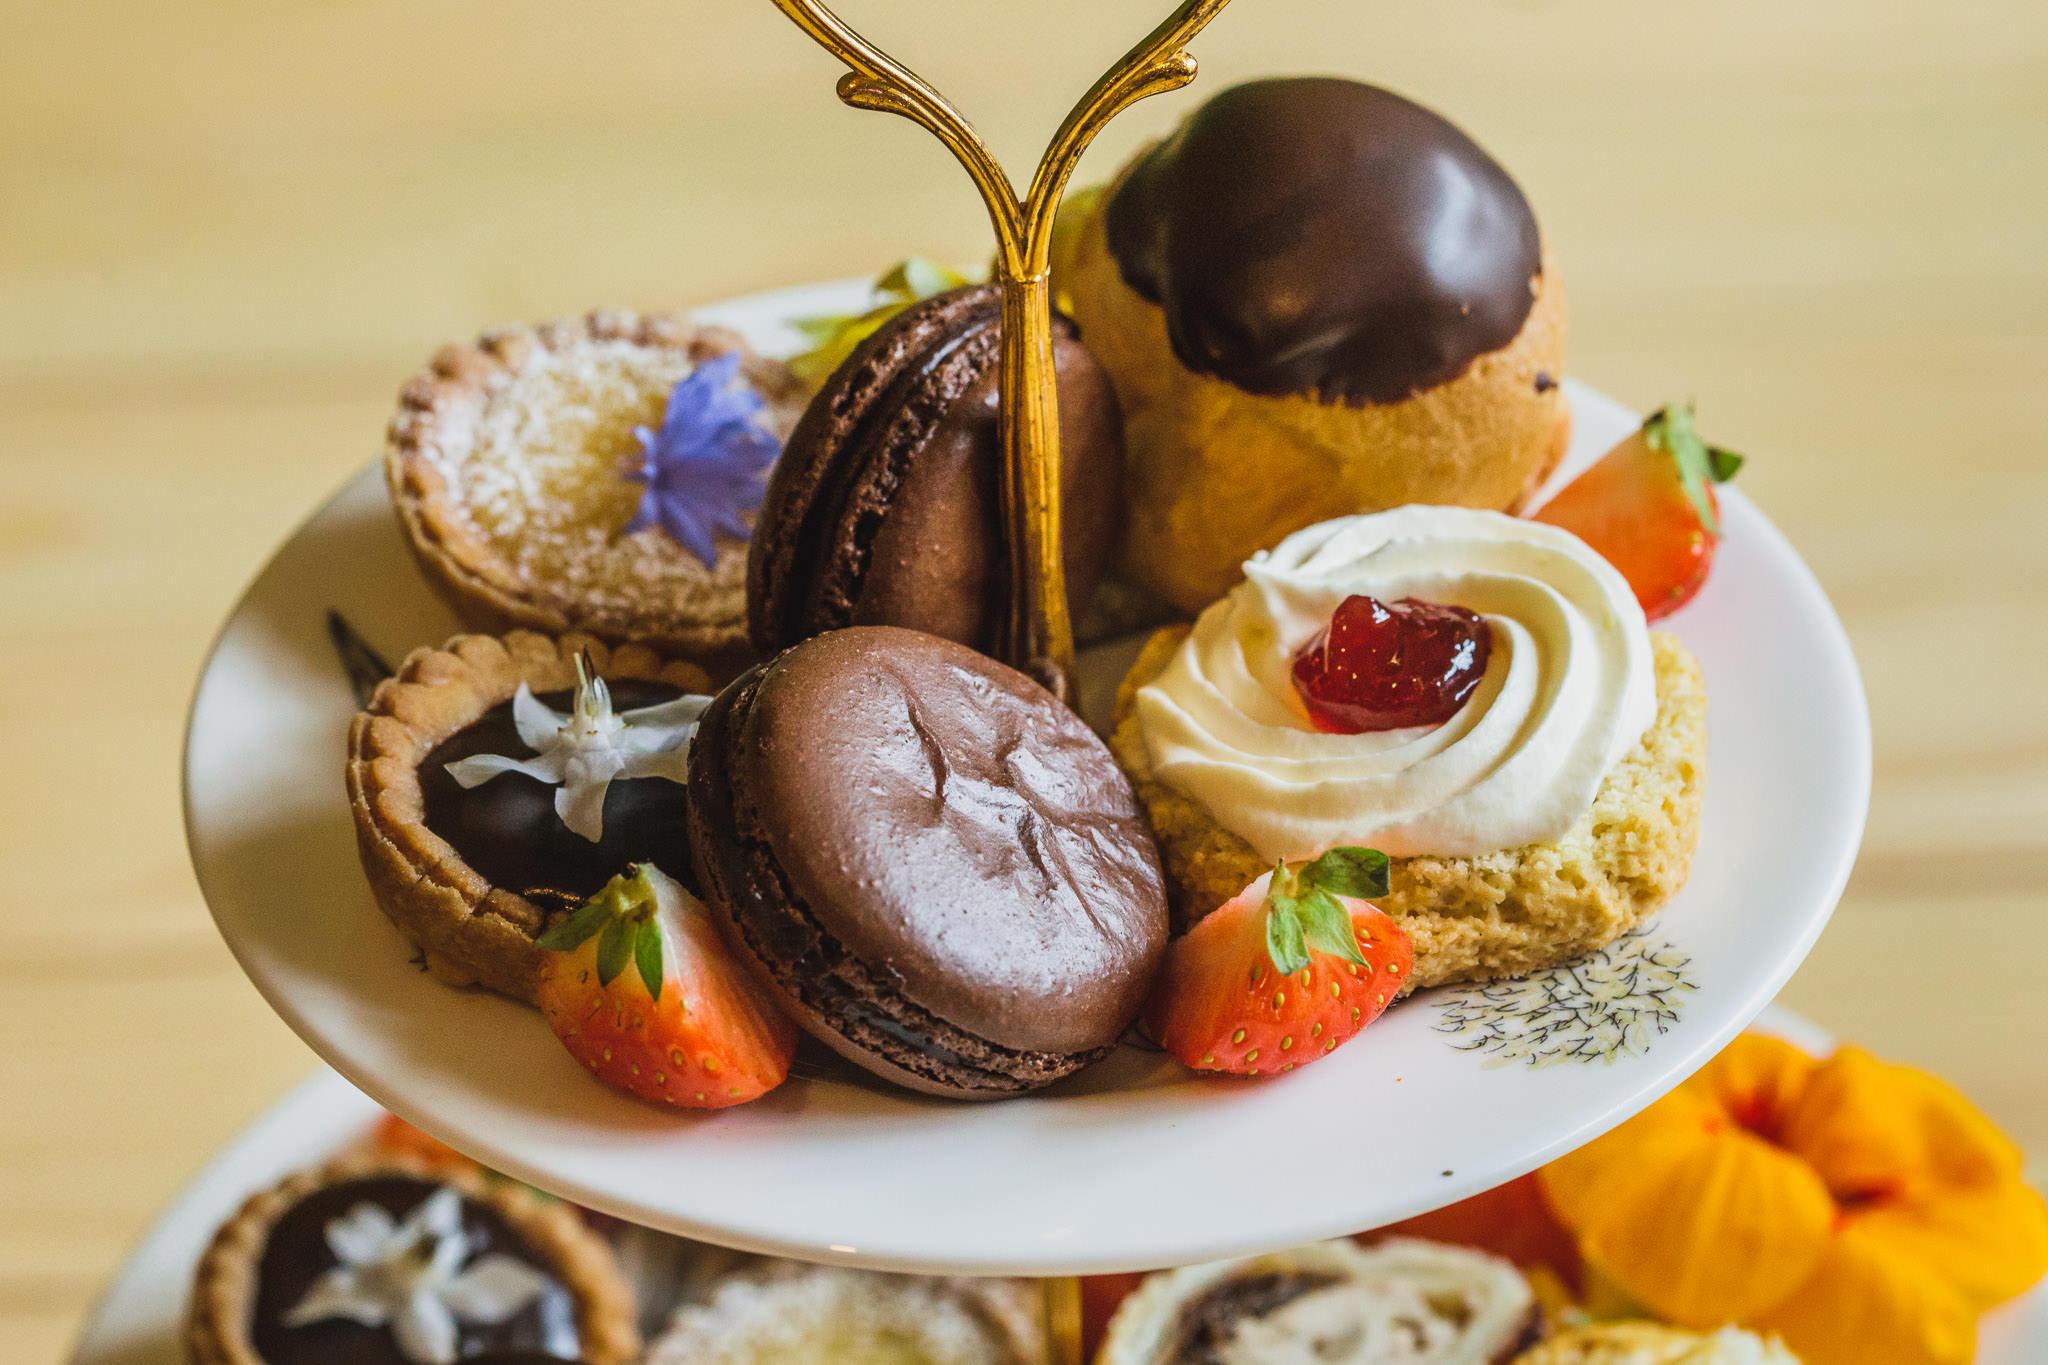 Afternoon tea cake selection